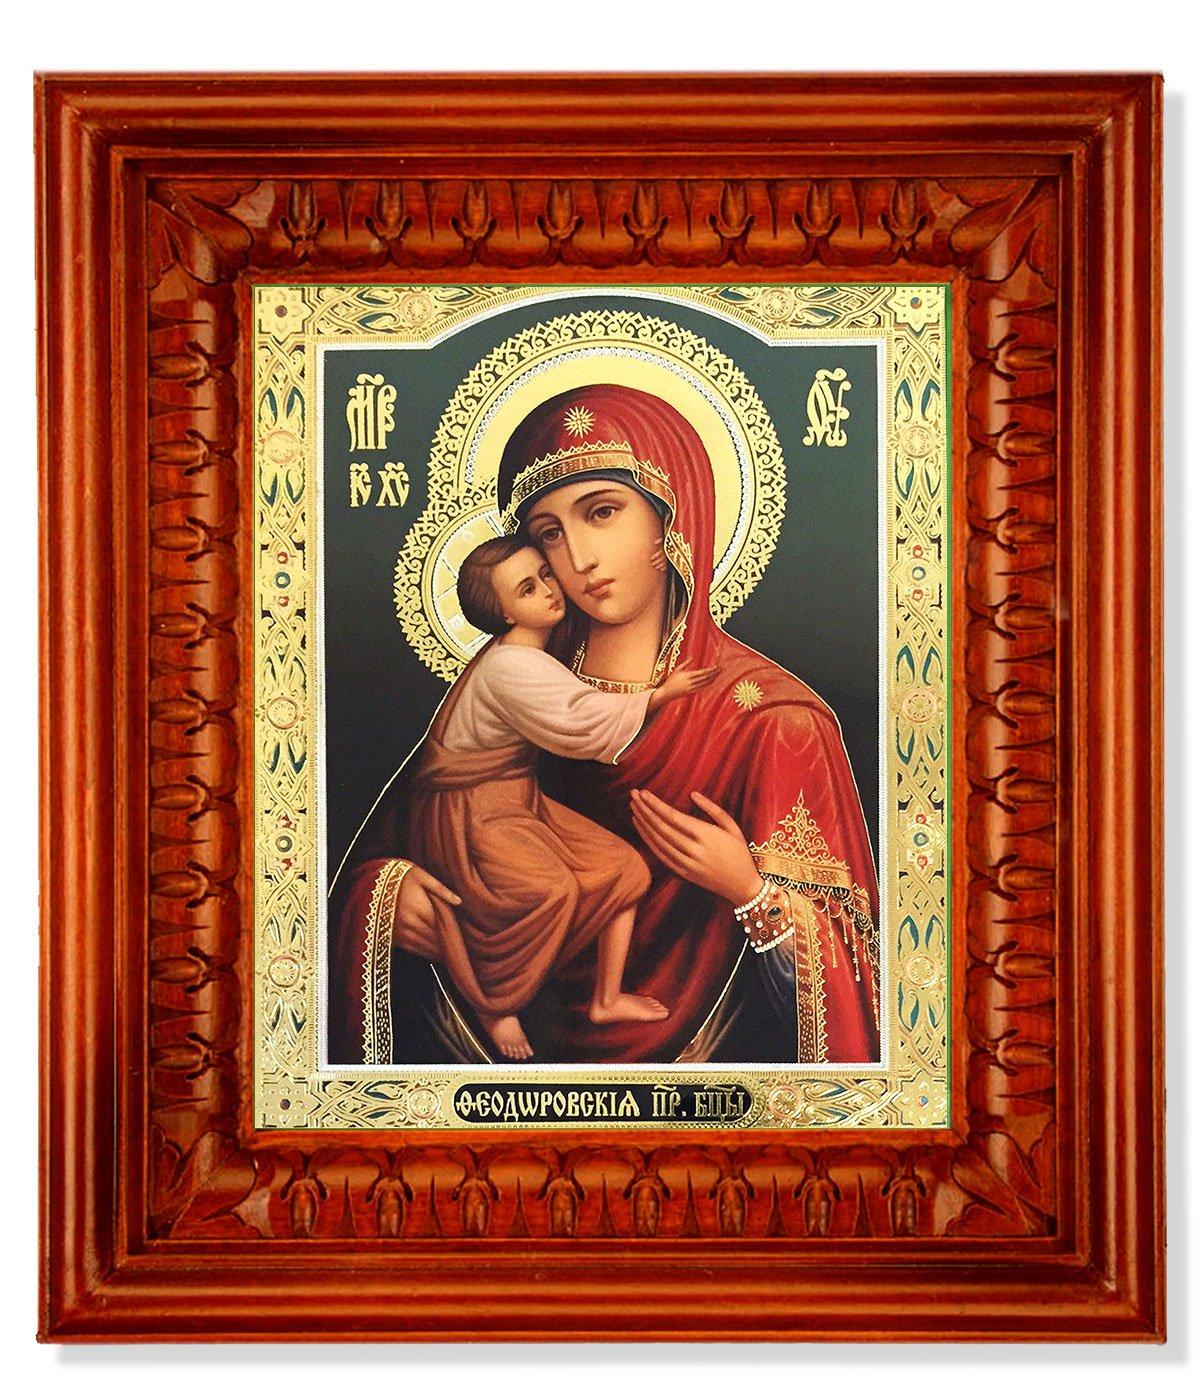 Orthodoxカトリックロシアアイコン聖母と子木製神社ガラス11 1 / 2インチ   B01M1IZBUL